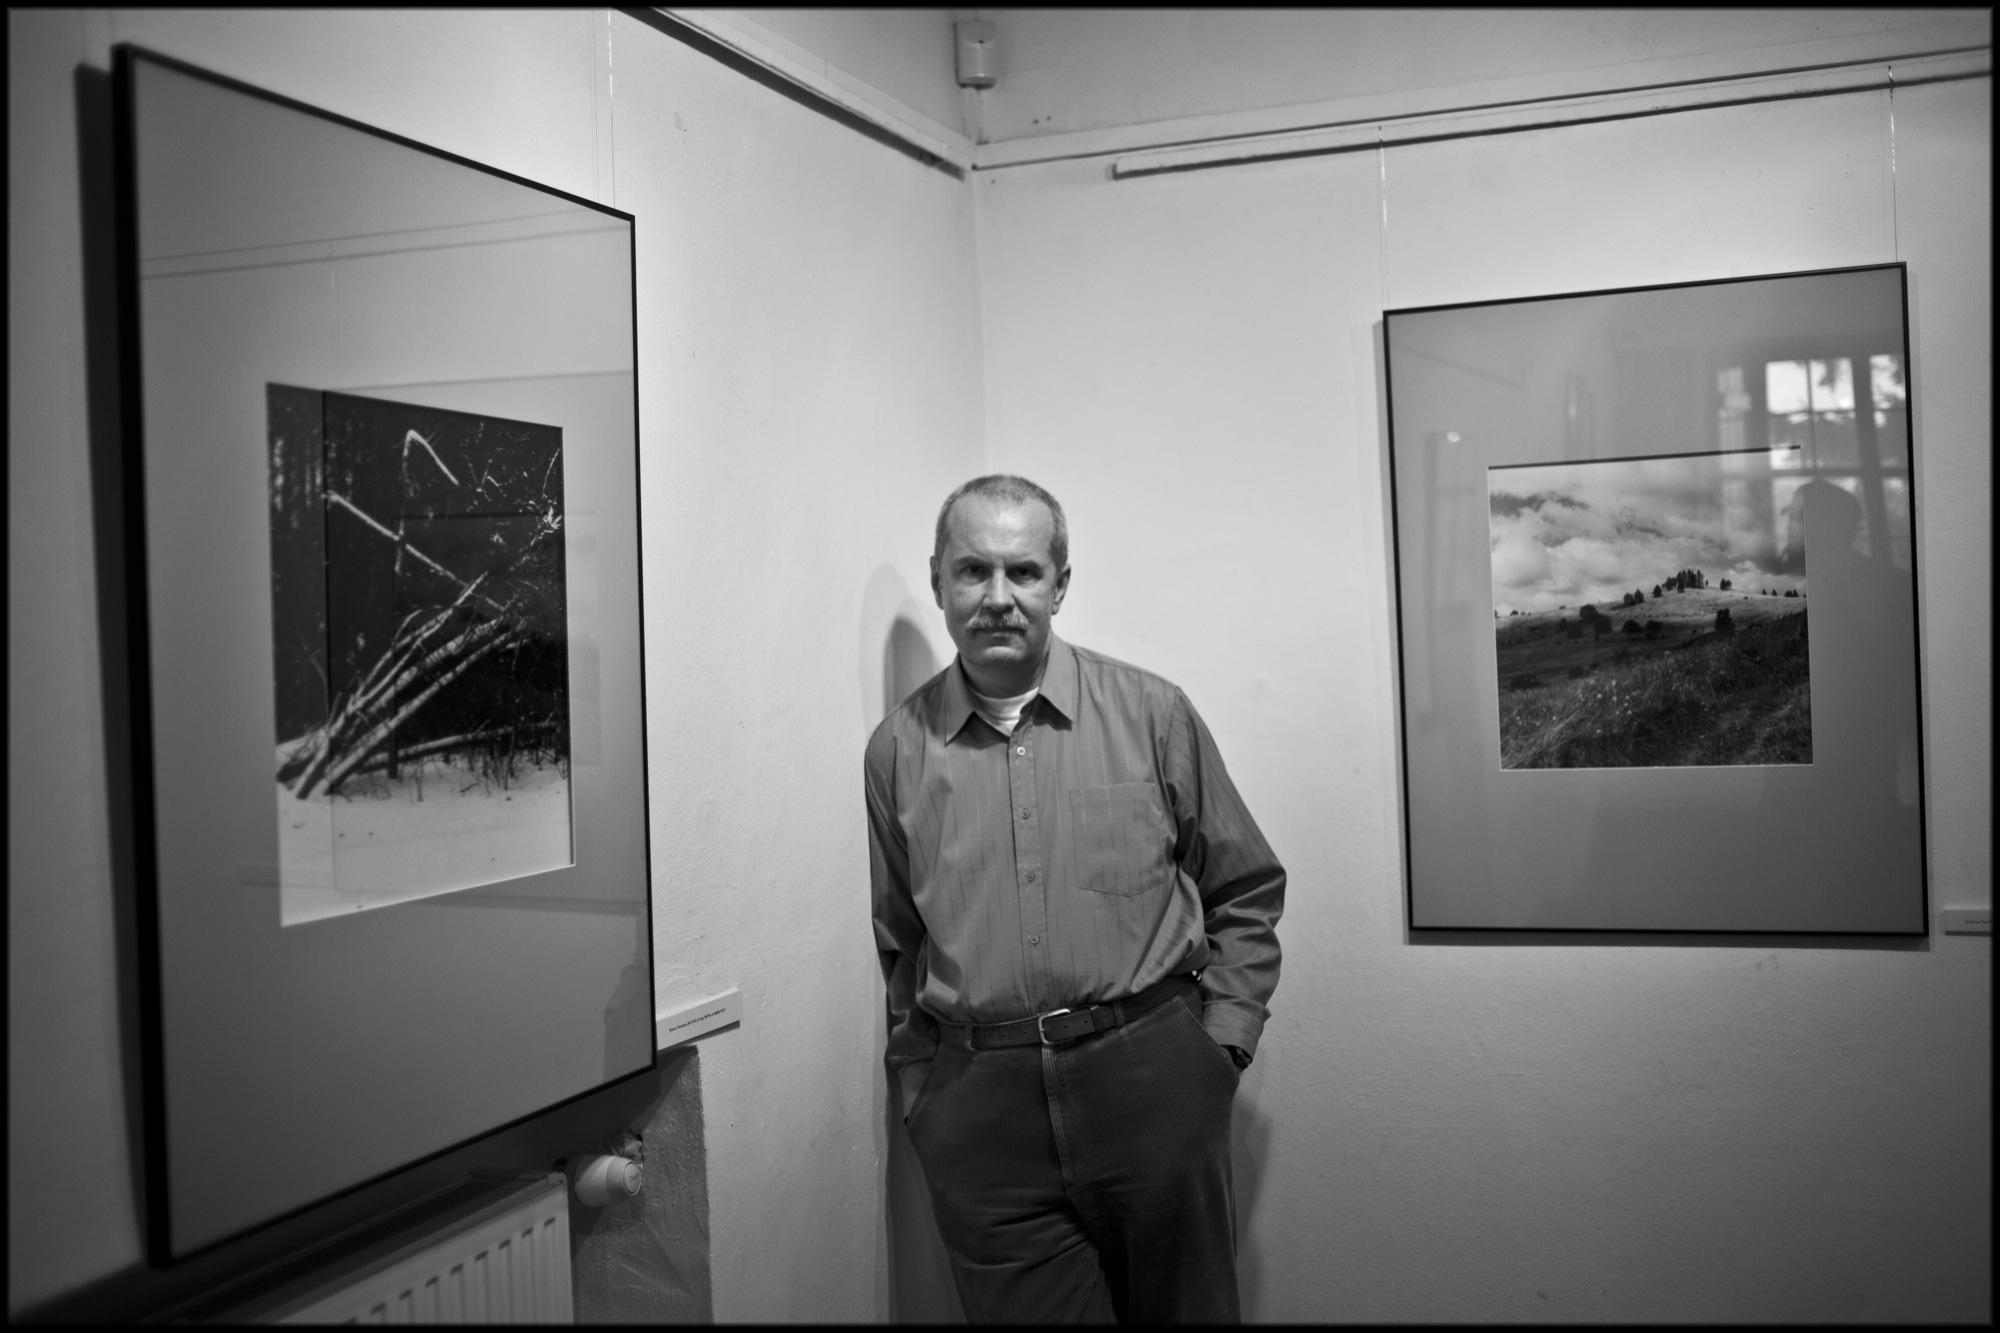 Jerzy Łapiński fot. Edgar de Poray